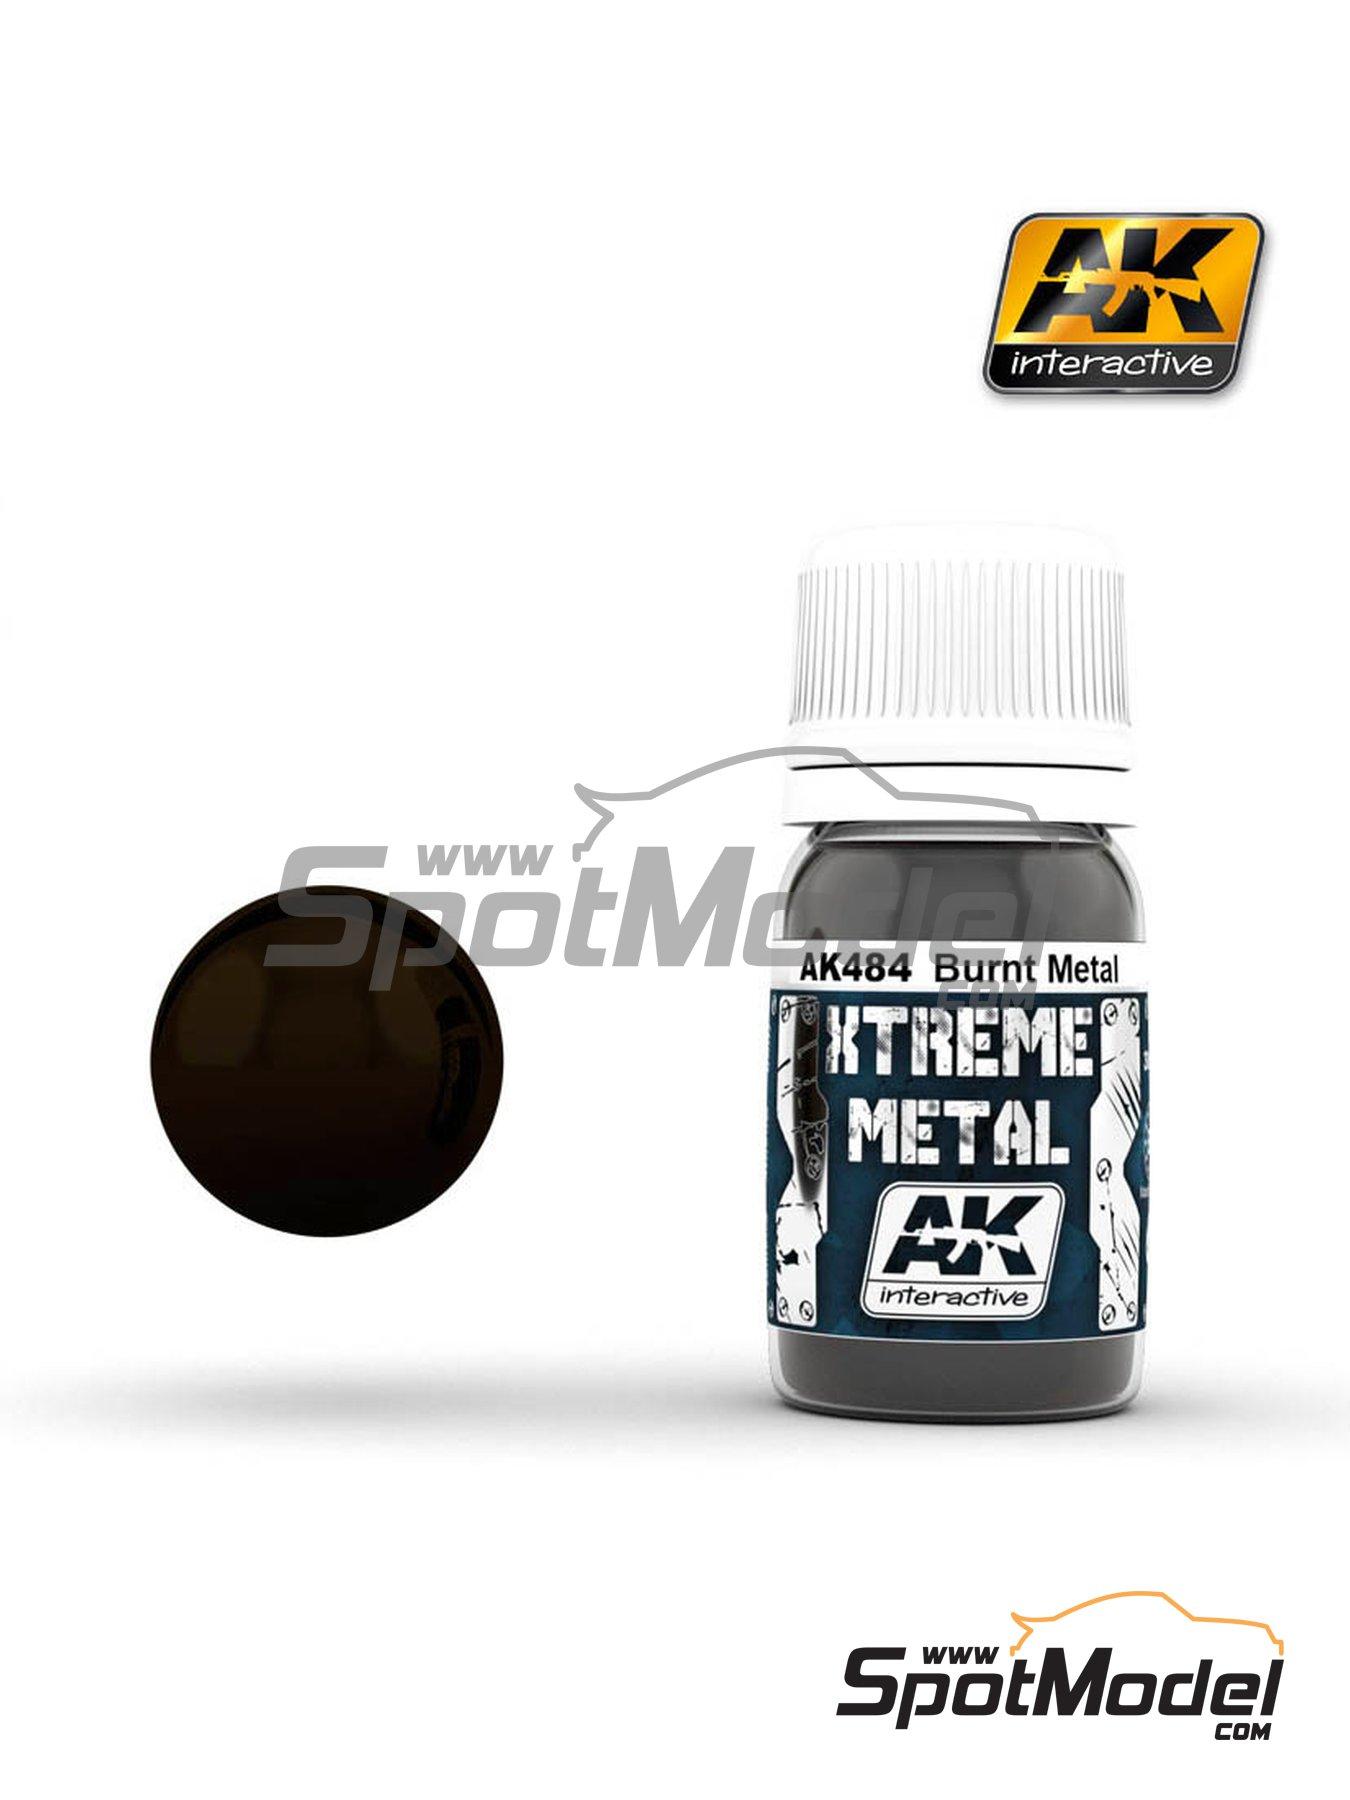 Burnt metal | Xtreme metal paint manufactured by AK Interactive (ref.AK-484) image